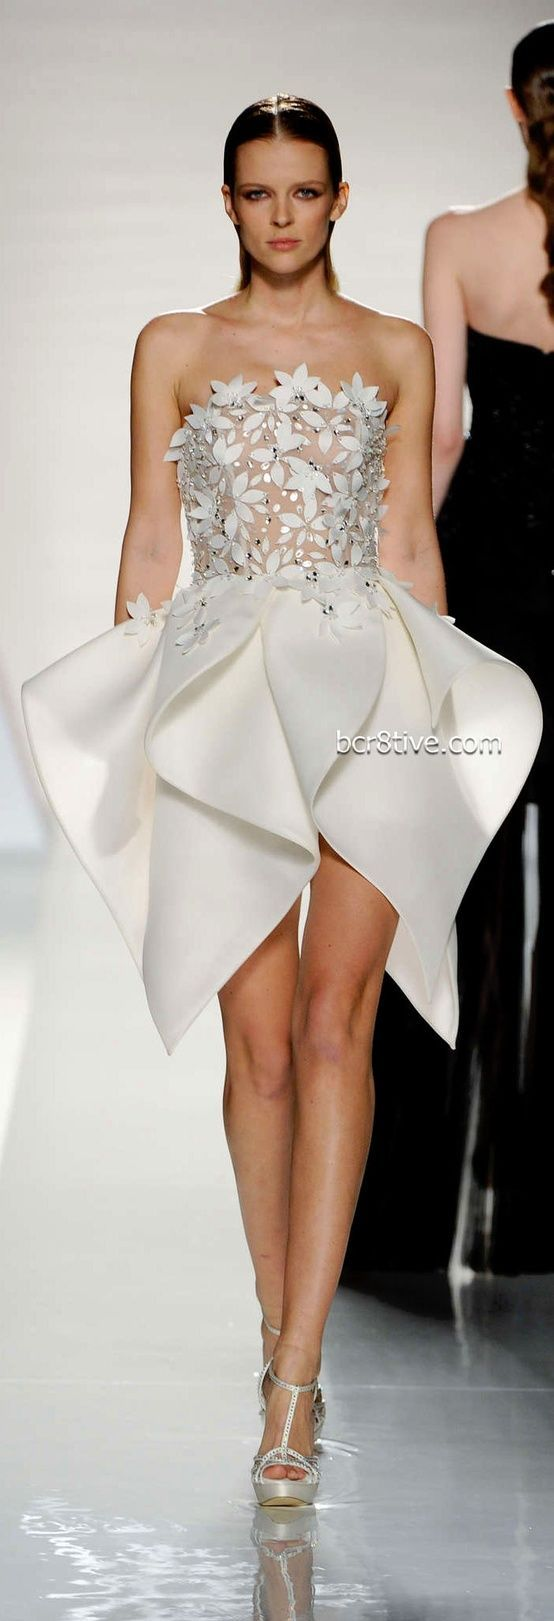 Fustana 2015 modele te fustanave 2015 dresses 2015 fustana modele te - Koleksioni I Fustanave 2014 2015 Fustana 2015 Modele Te Fustanave Dresses 2015